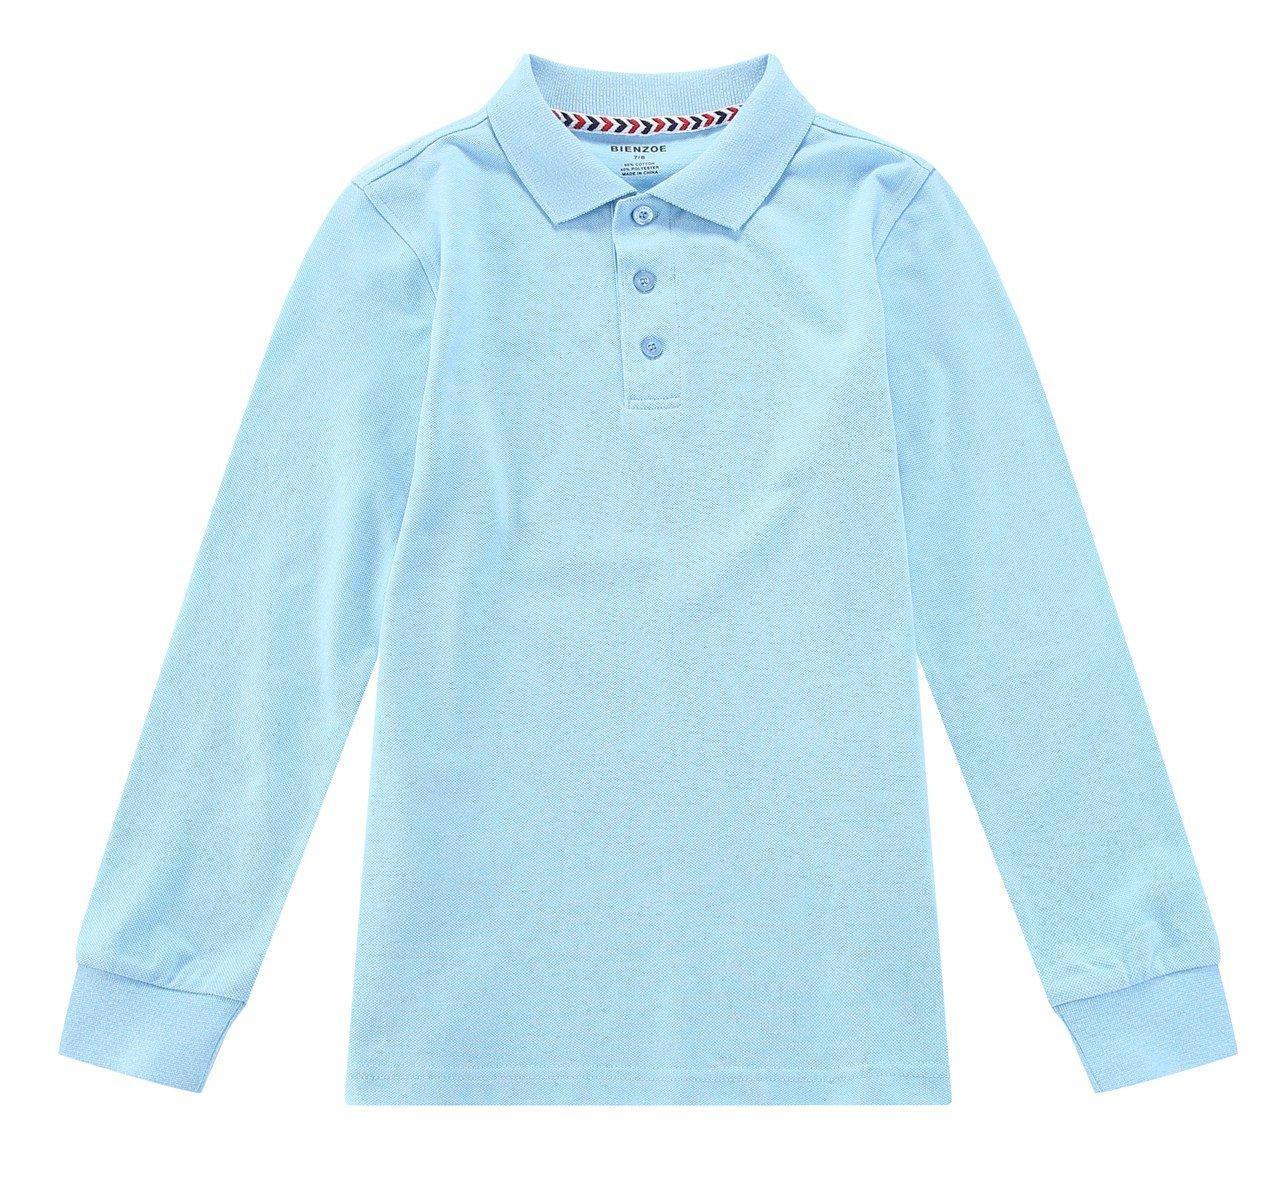 Bienzoe Boy's School Uniform Antimicrobial Breathable Quick Dry Long Sleeve Polo Blue 10/12